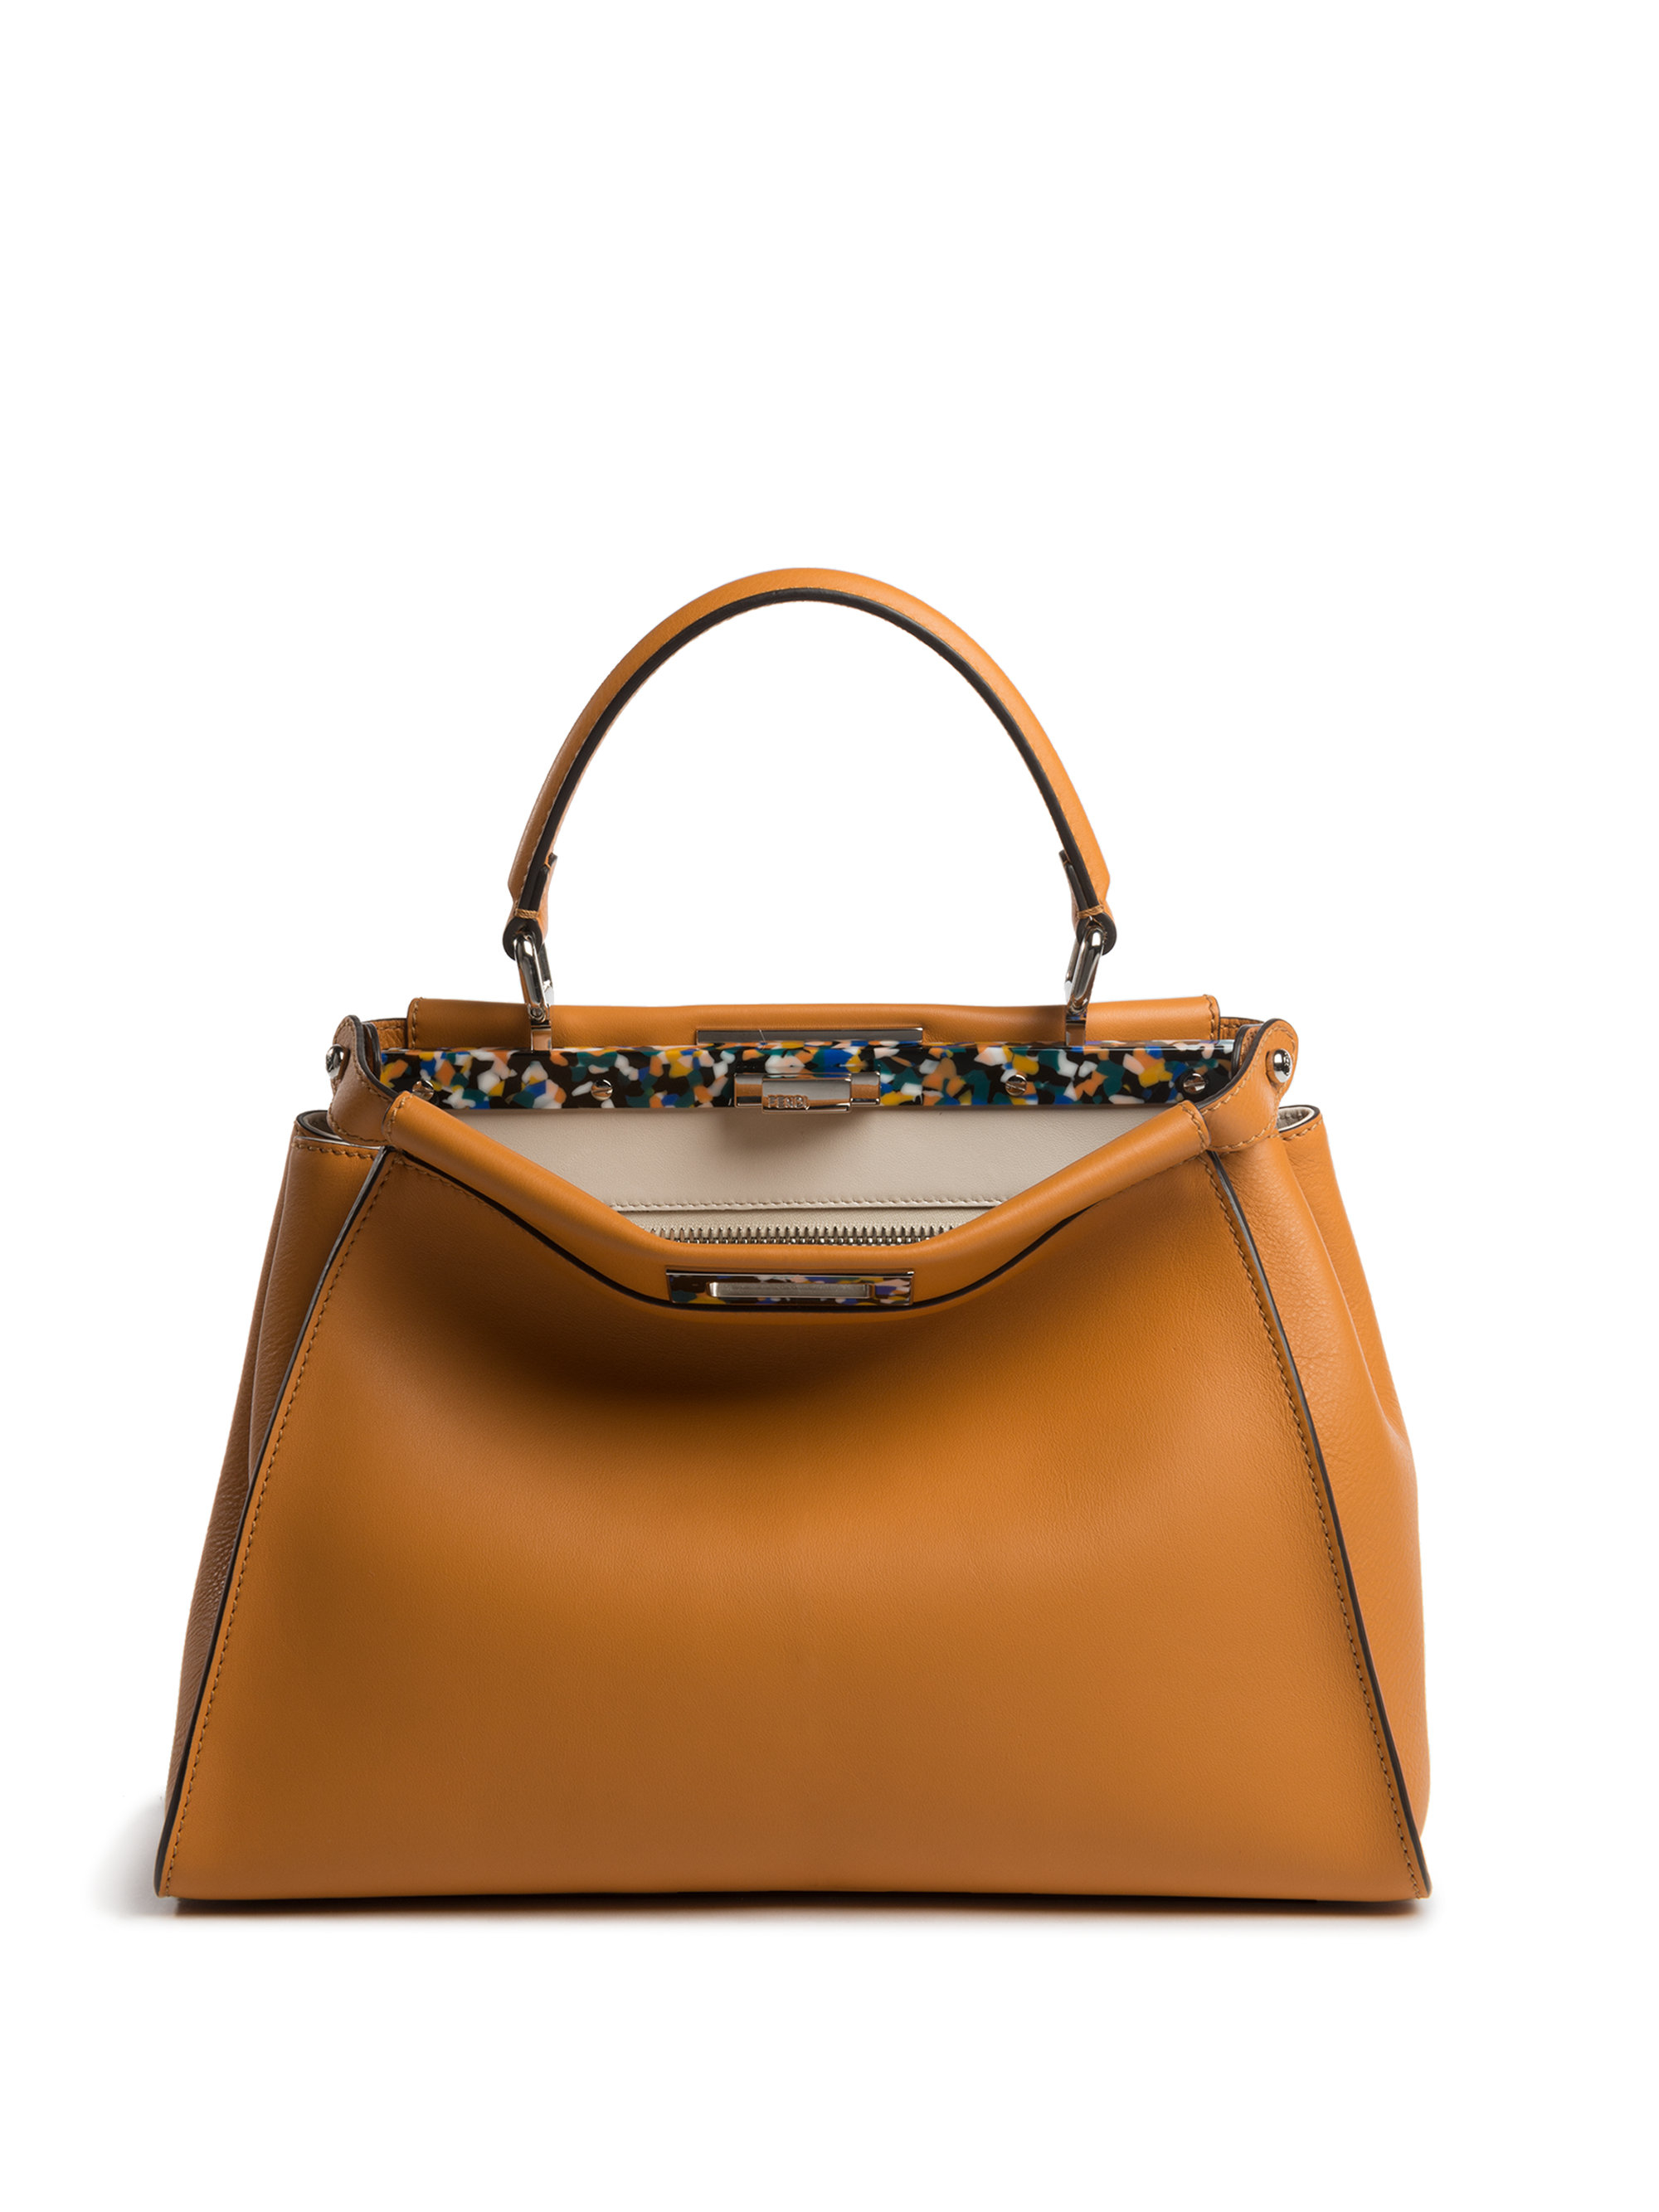 dcedc74699 Lyst - Fendi Peekaboo Medium Tile-accented Leather Satchel in Brown